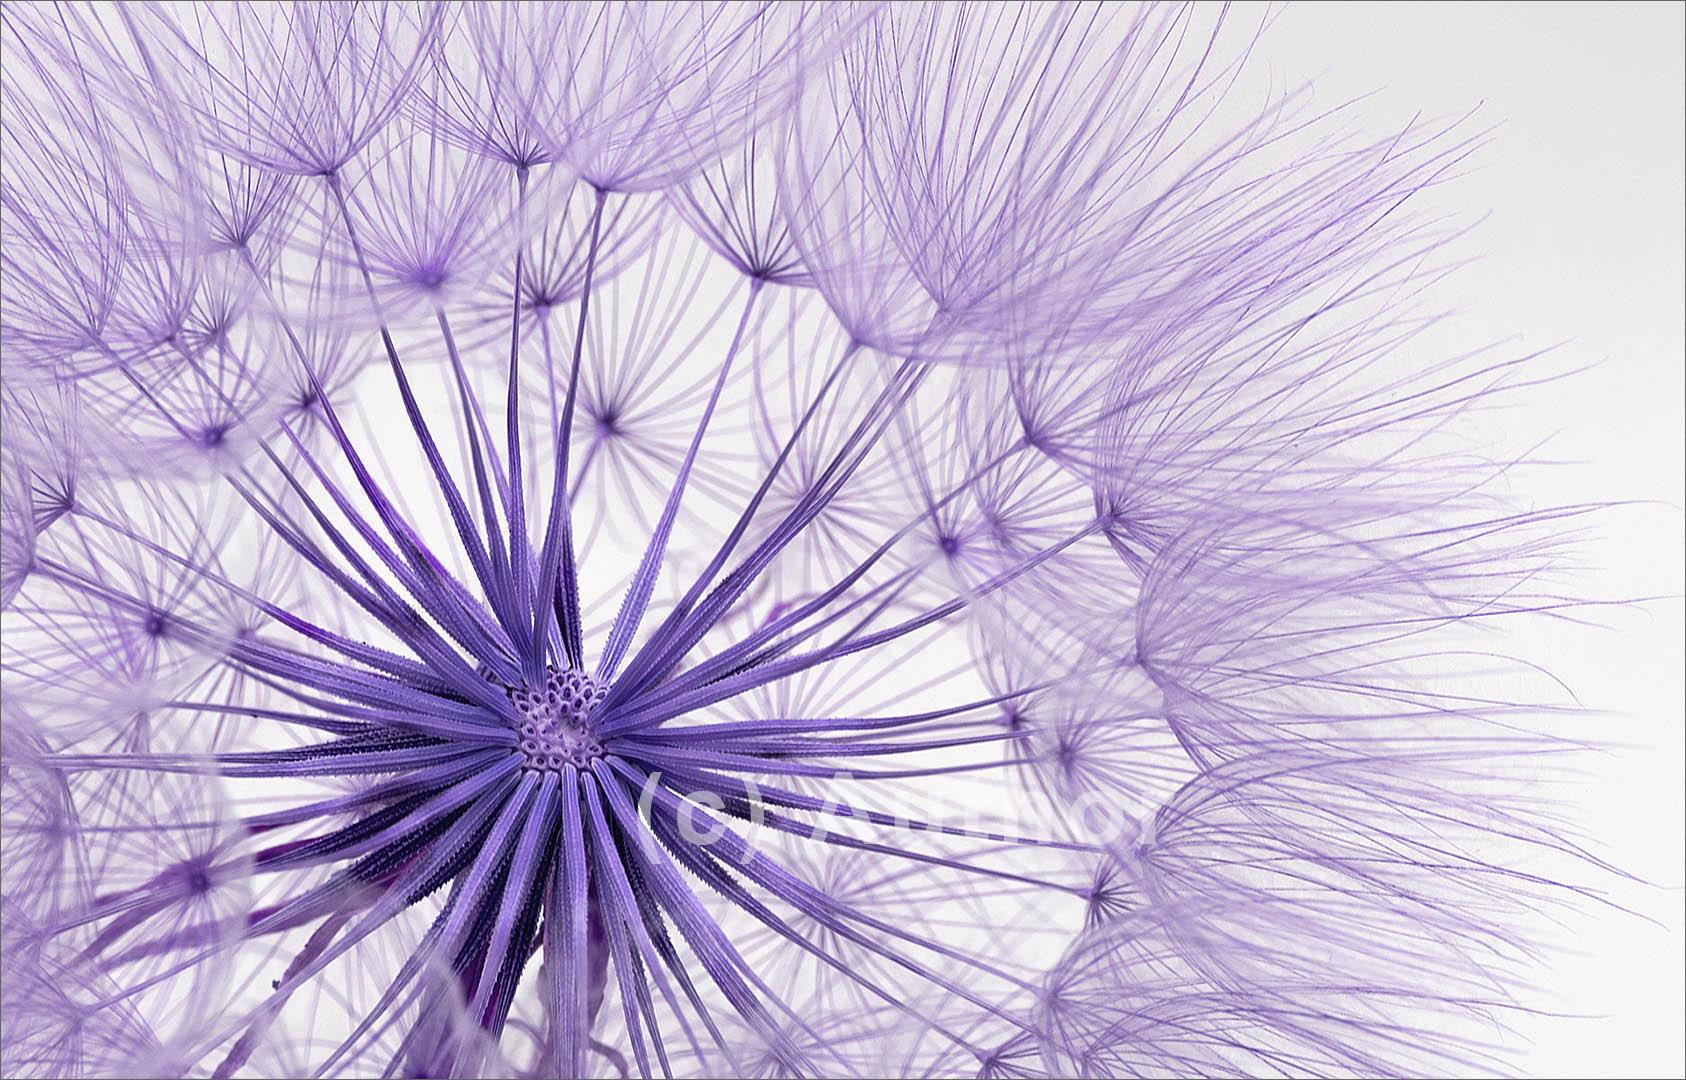 6_SS_Purple wishes_Natasha Bird